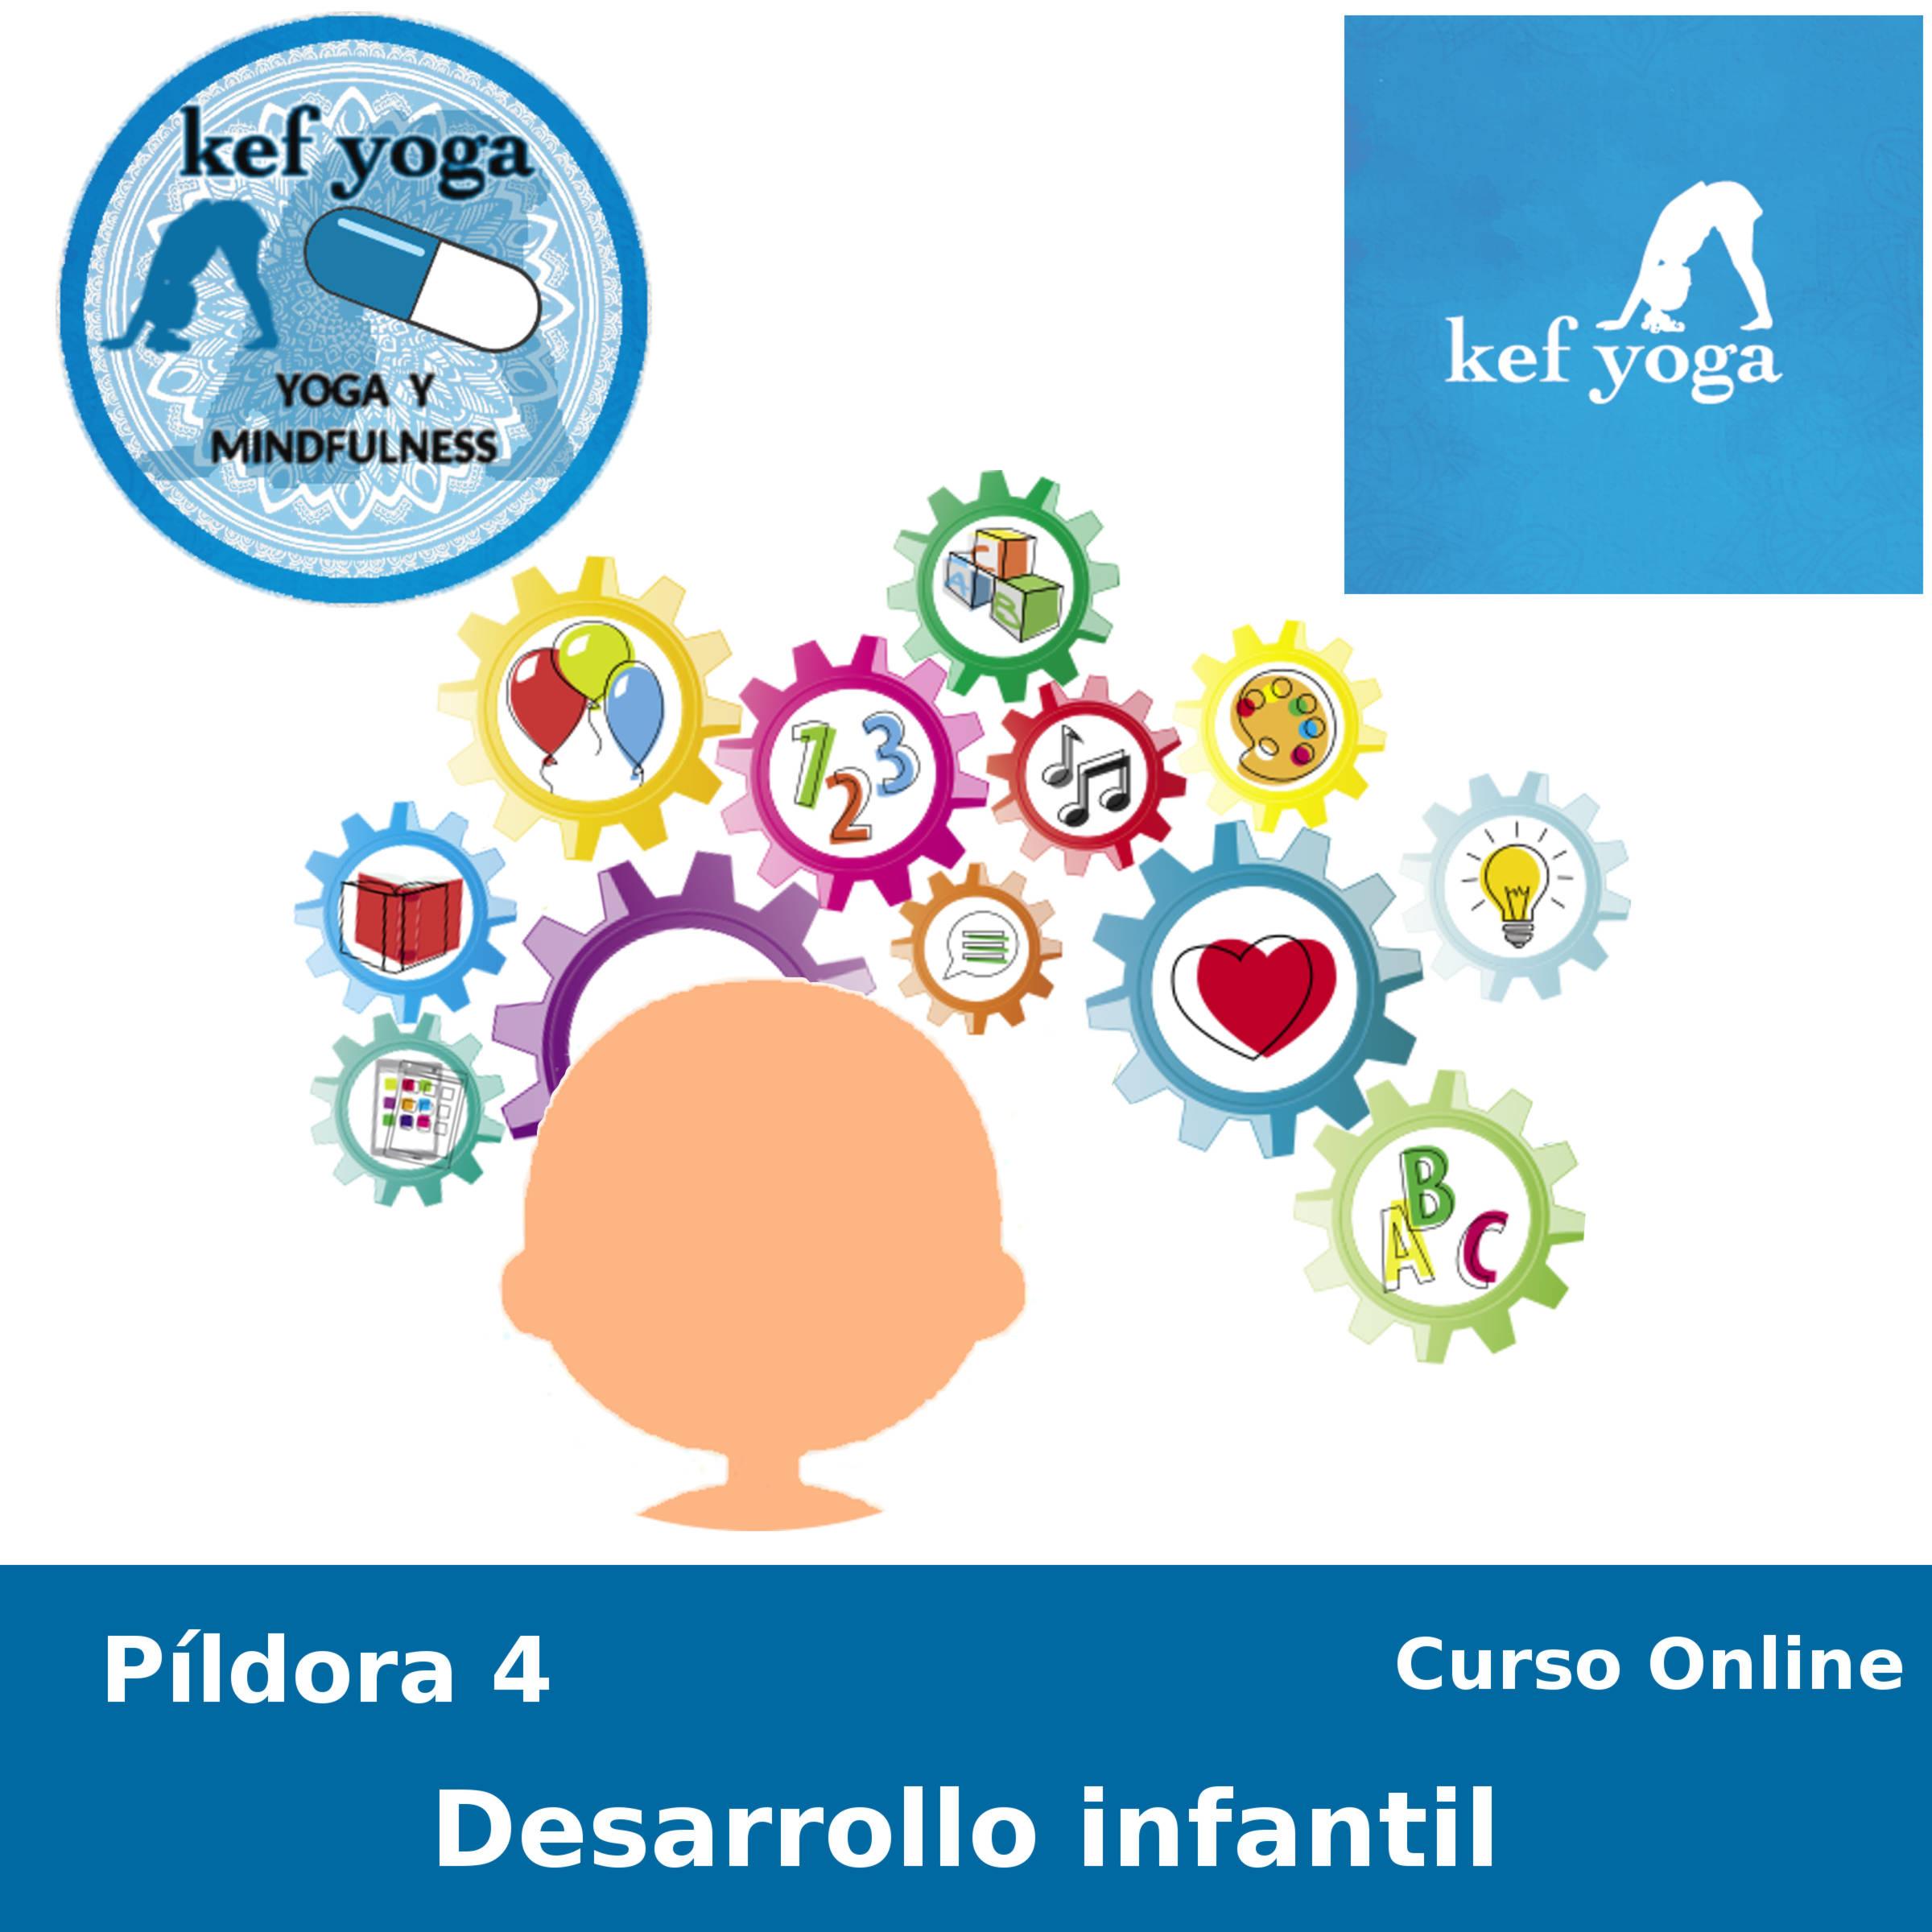 Píldora 4 – Desarrollo infantil